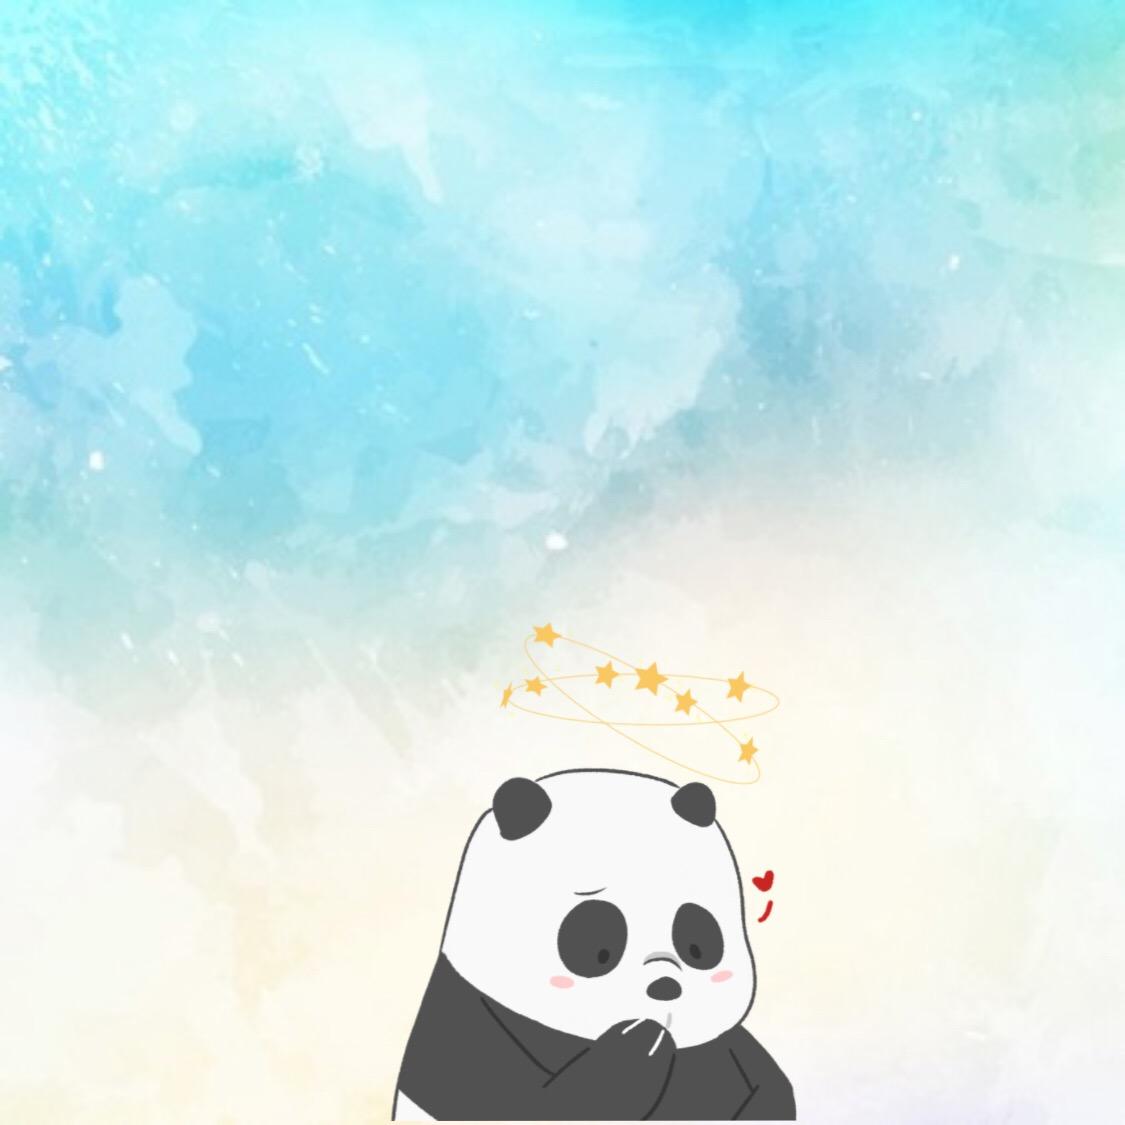 Wallpaper Panda From We Bare Bears